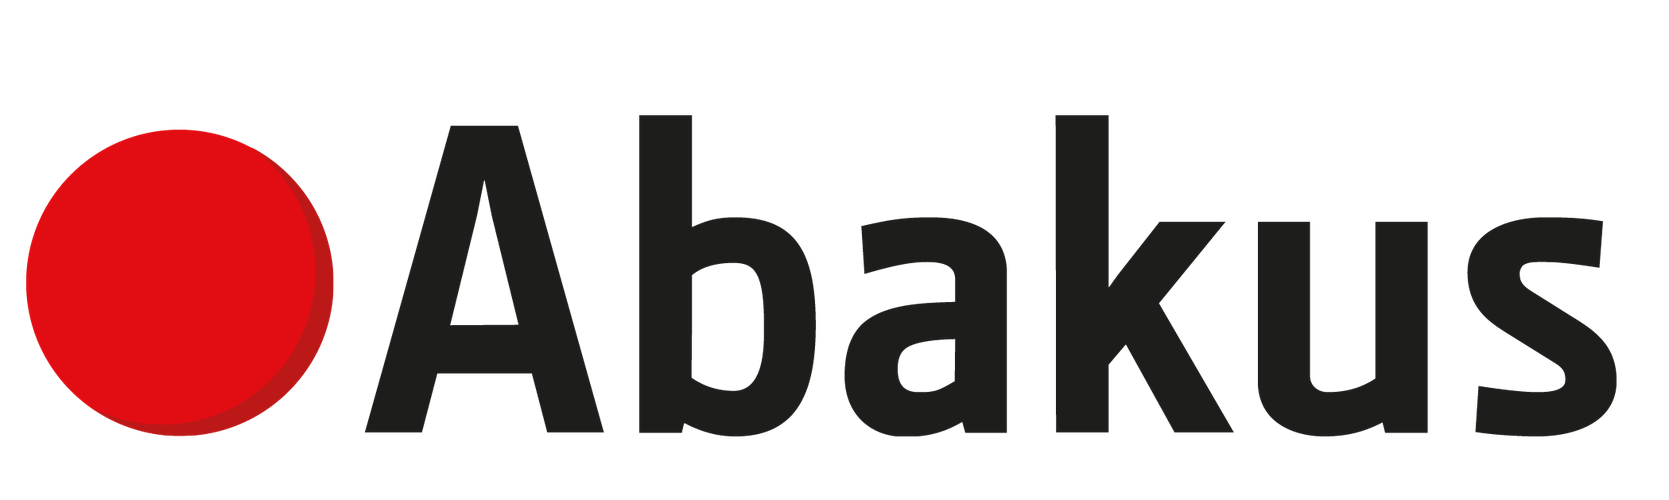 Avtalevilkår page banner